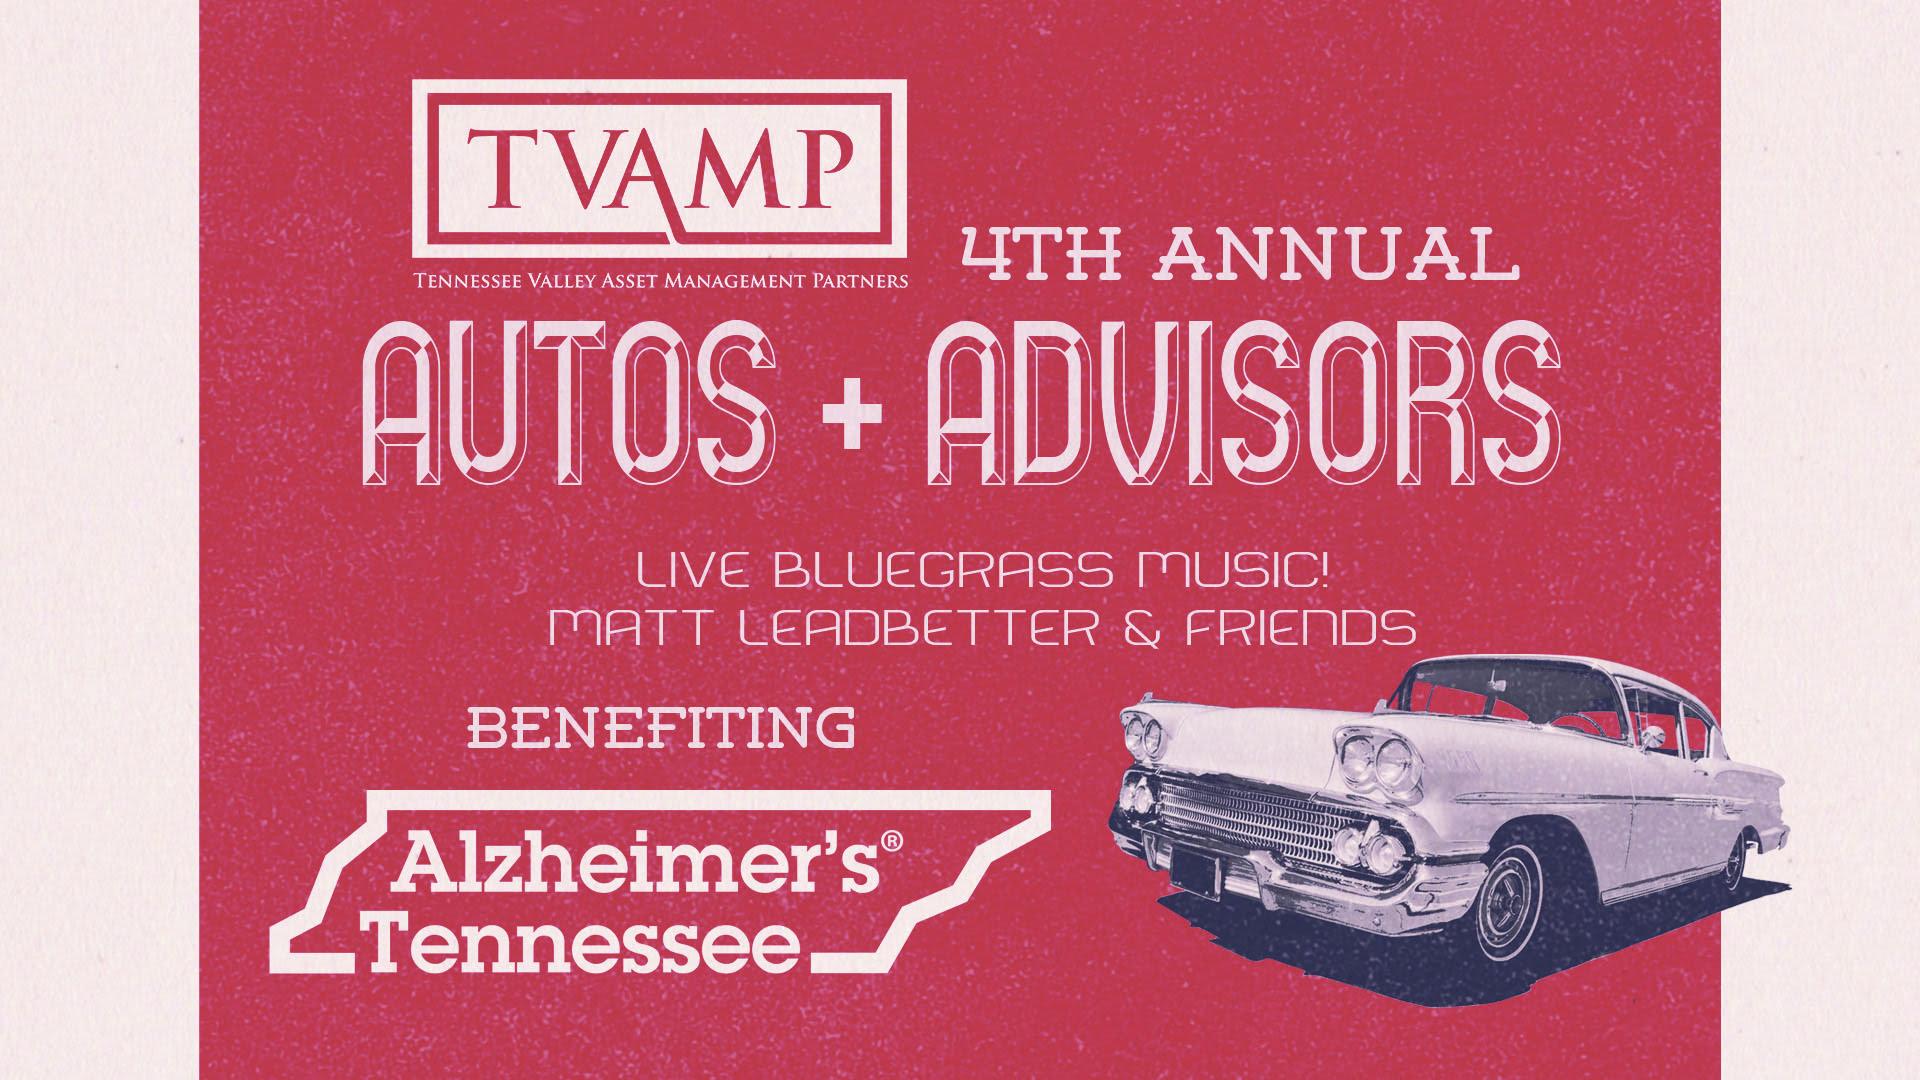 TVAMP Car Show Autos and Advisors 2019